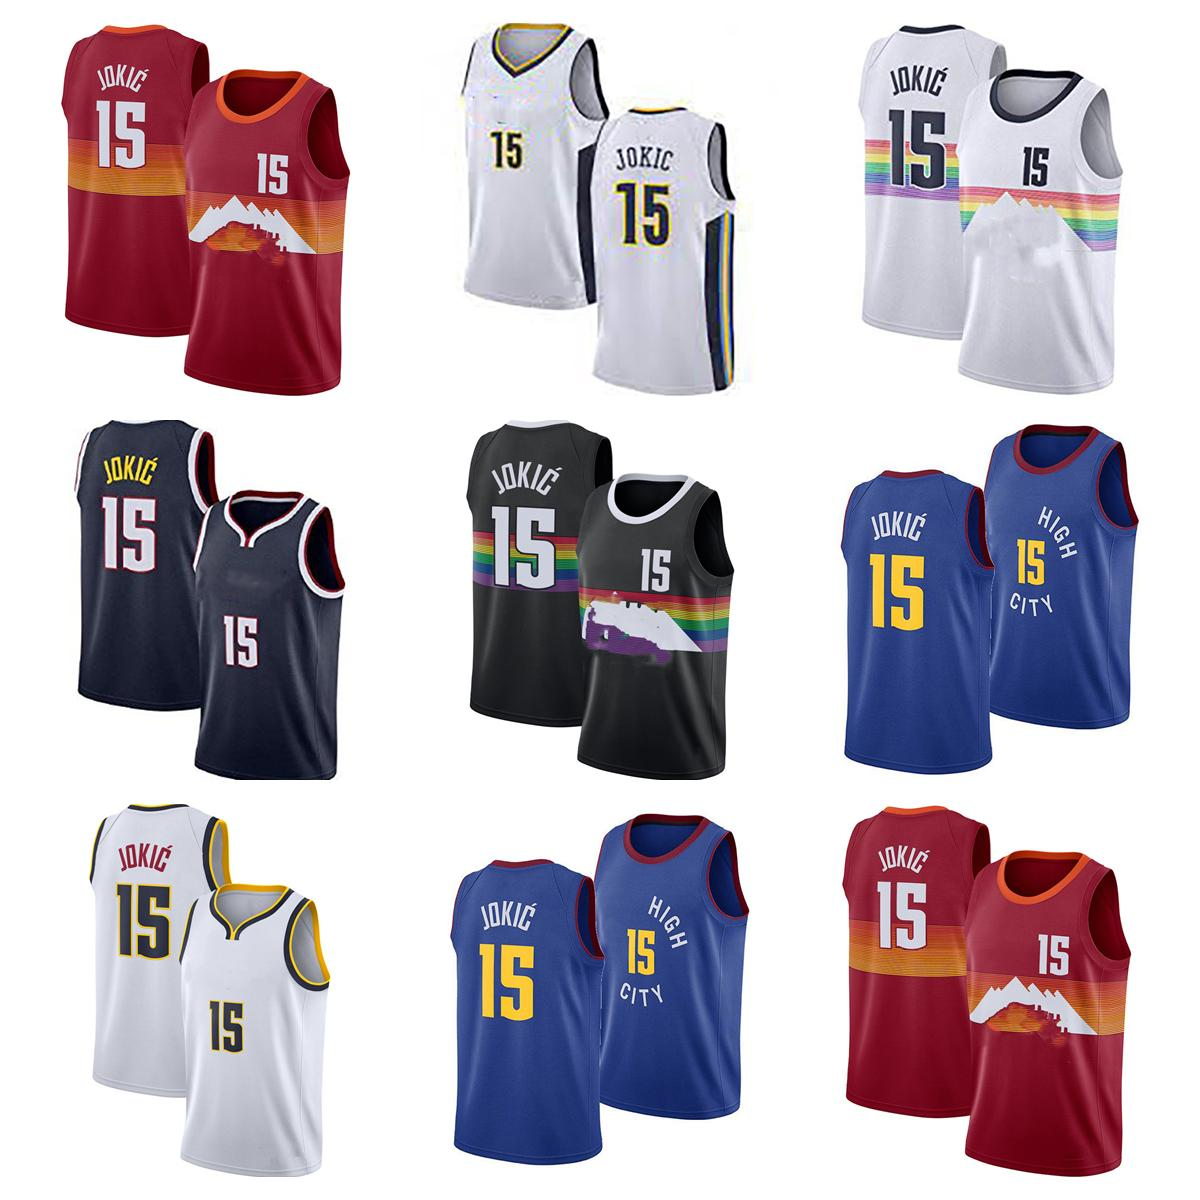 Männer 2021 Basketball Jersey 6 Kristaps Porzingis 41 Dirk Nowitzki 77 Luka Doncic